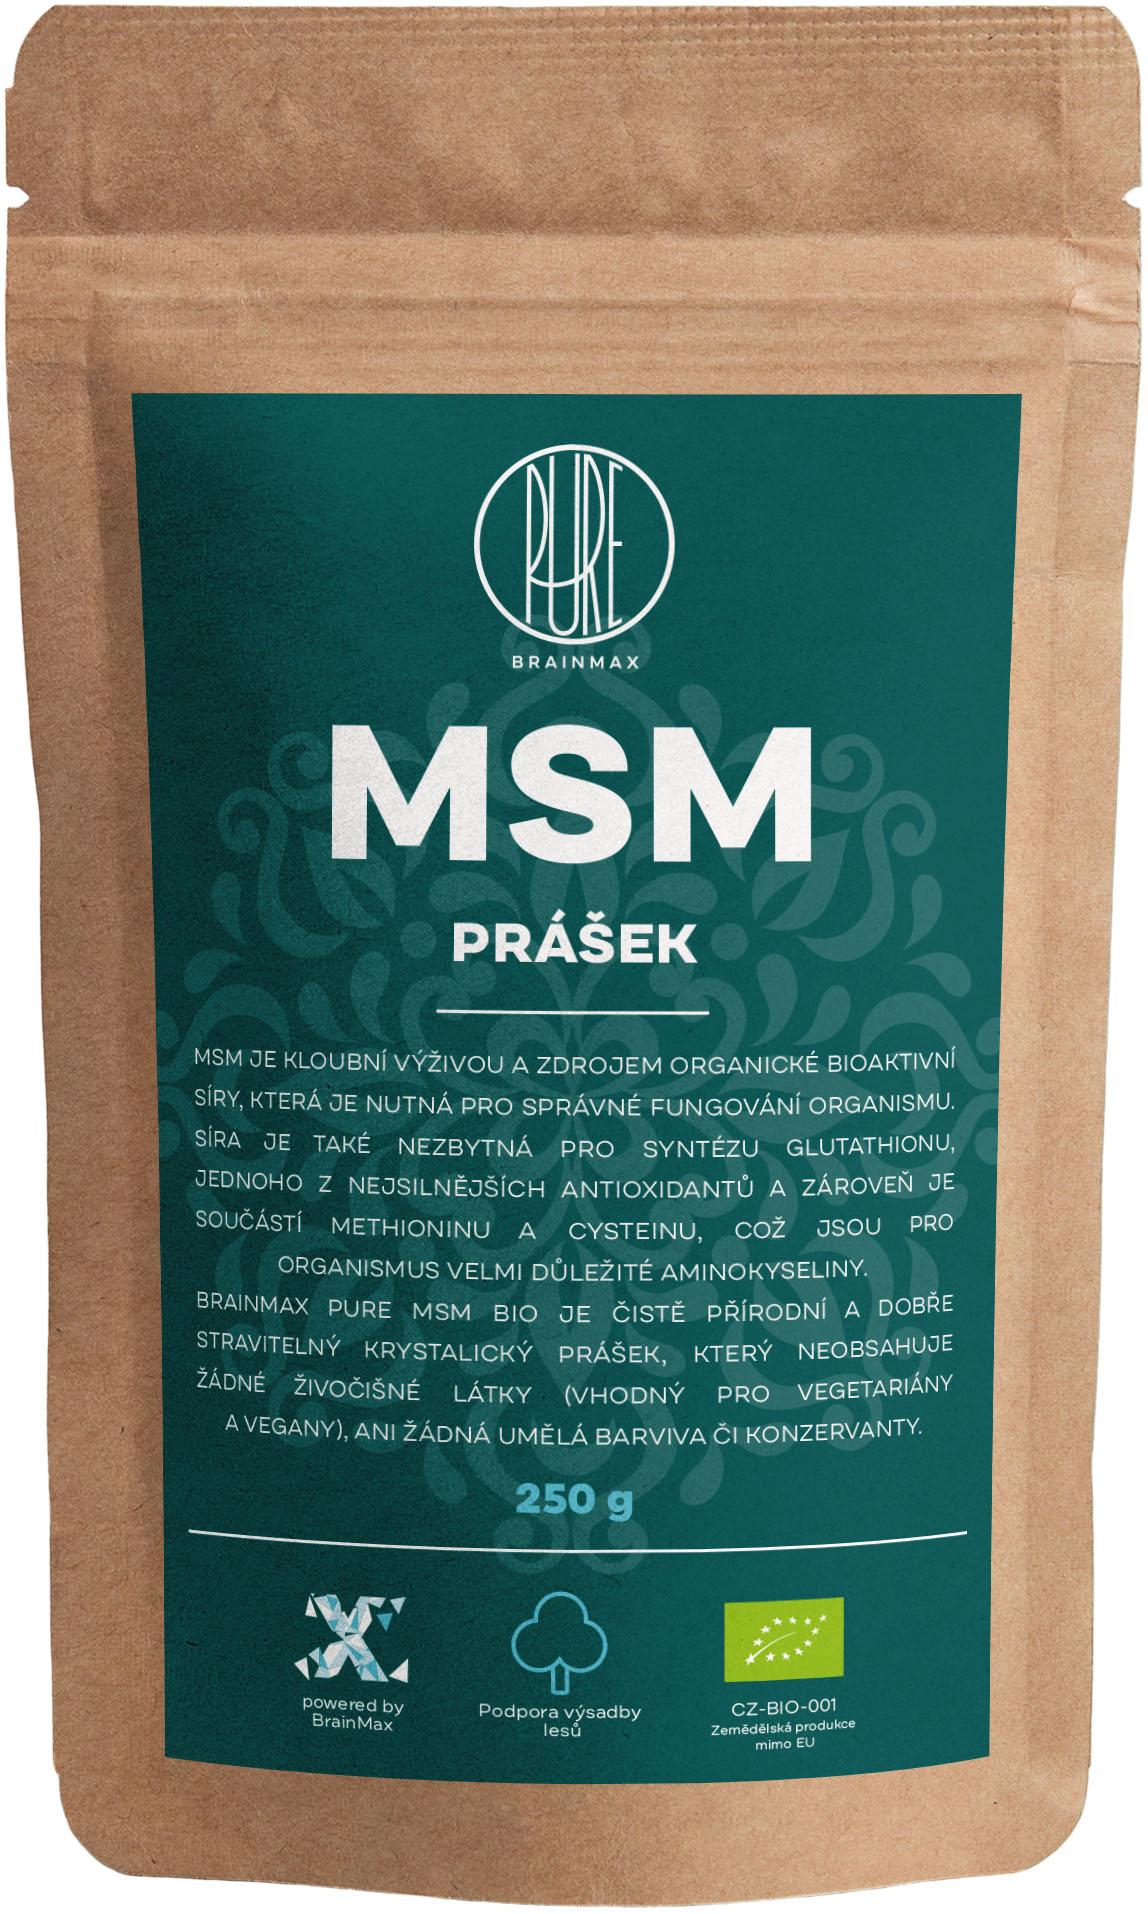 BrainMax Pure MSM BIO prášok, 250 g *CZ-BIO-001 certifikát